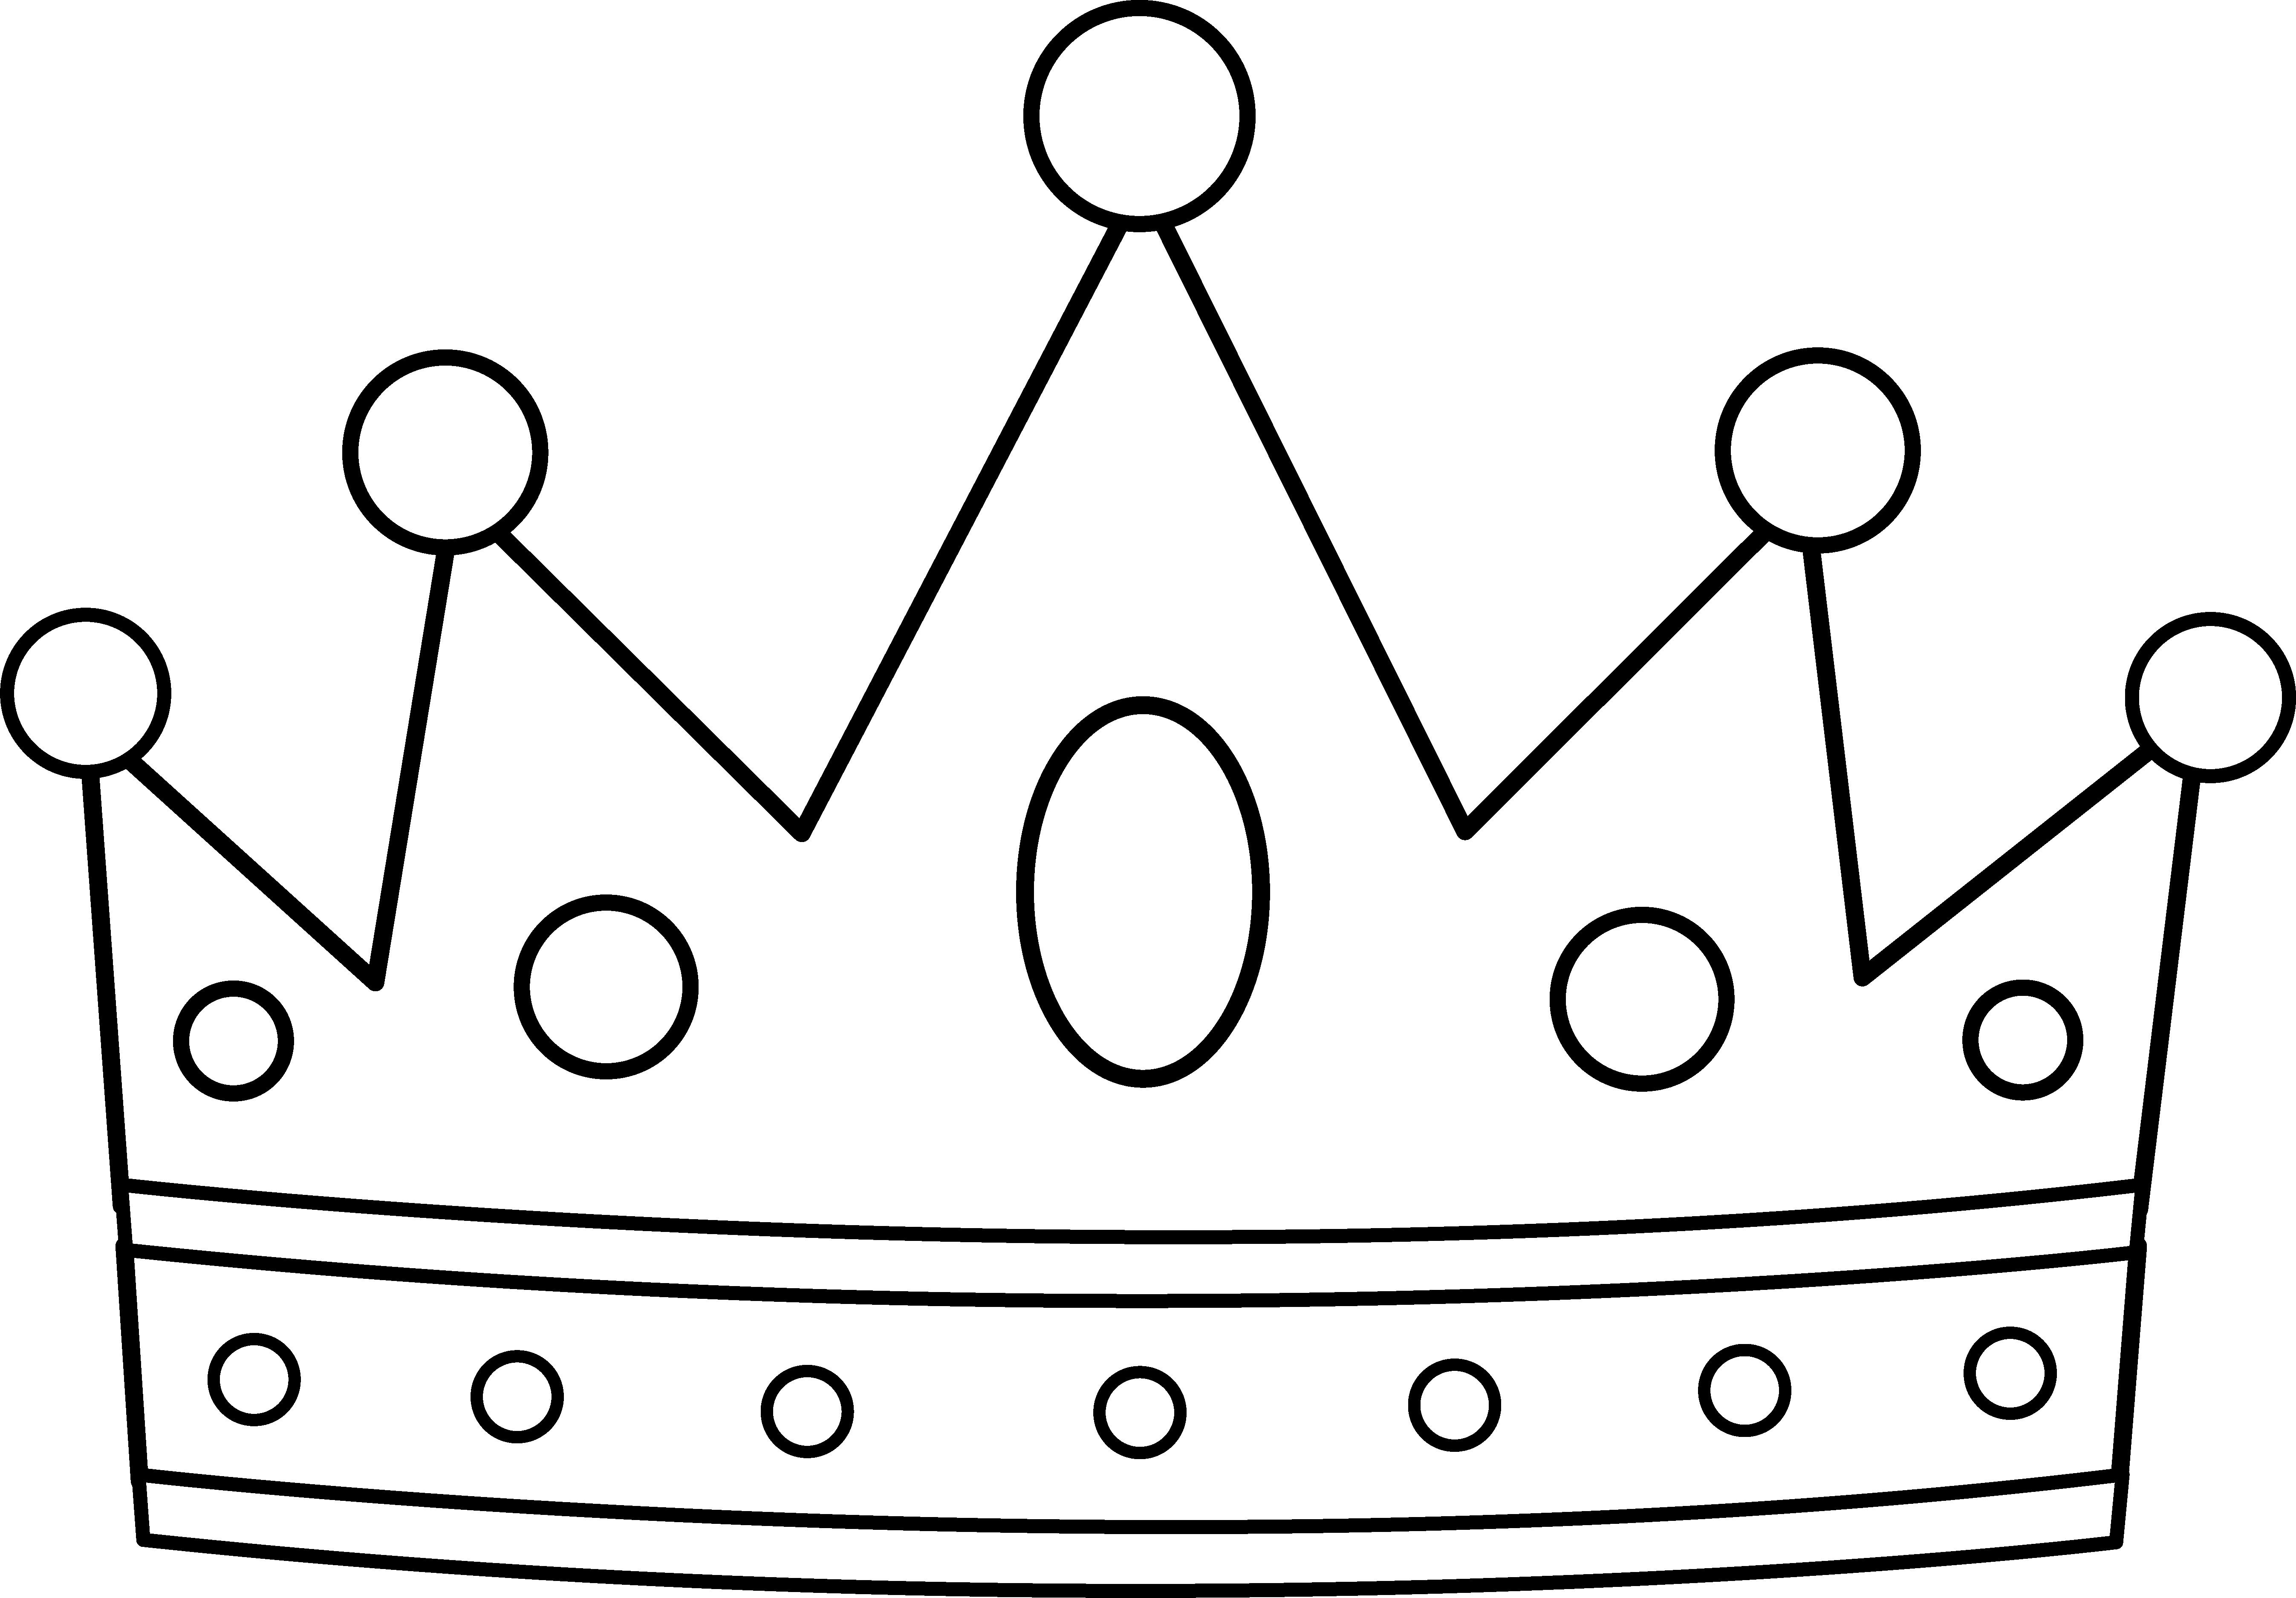 5387x3750 Princess Royal Crown Clip Art Free Clipart Images